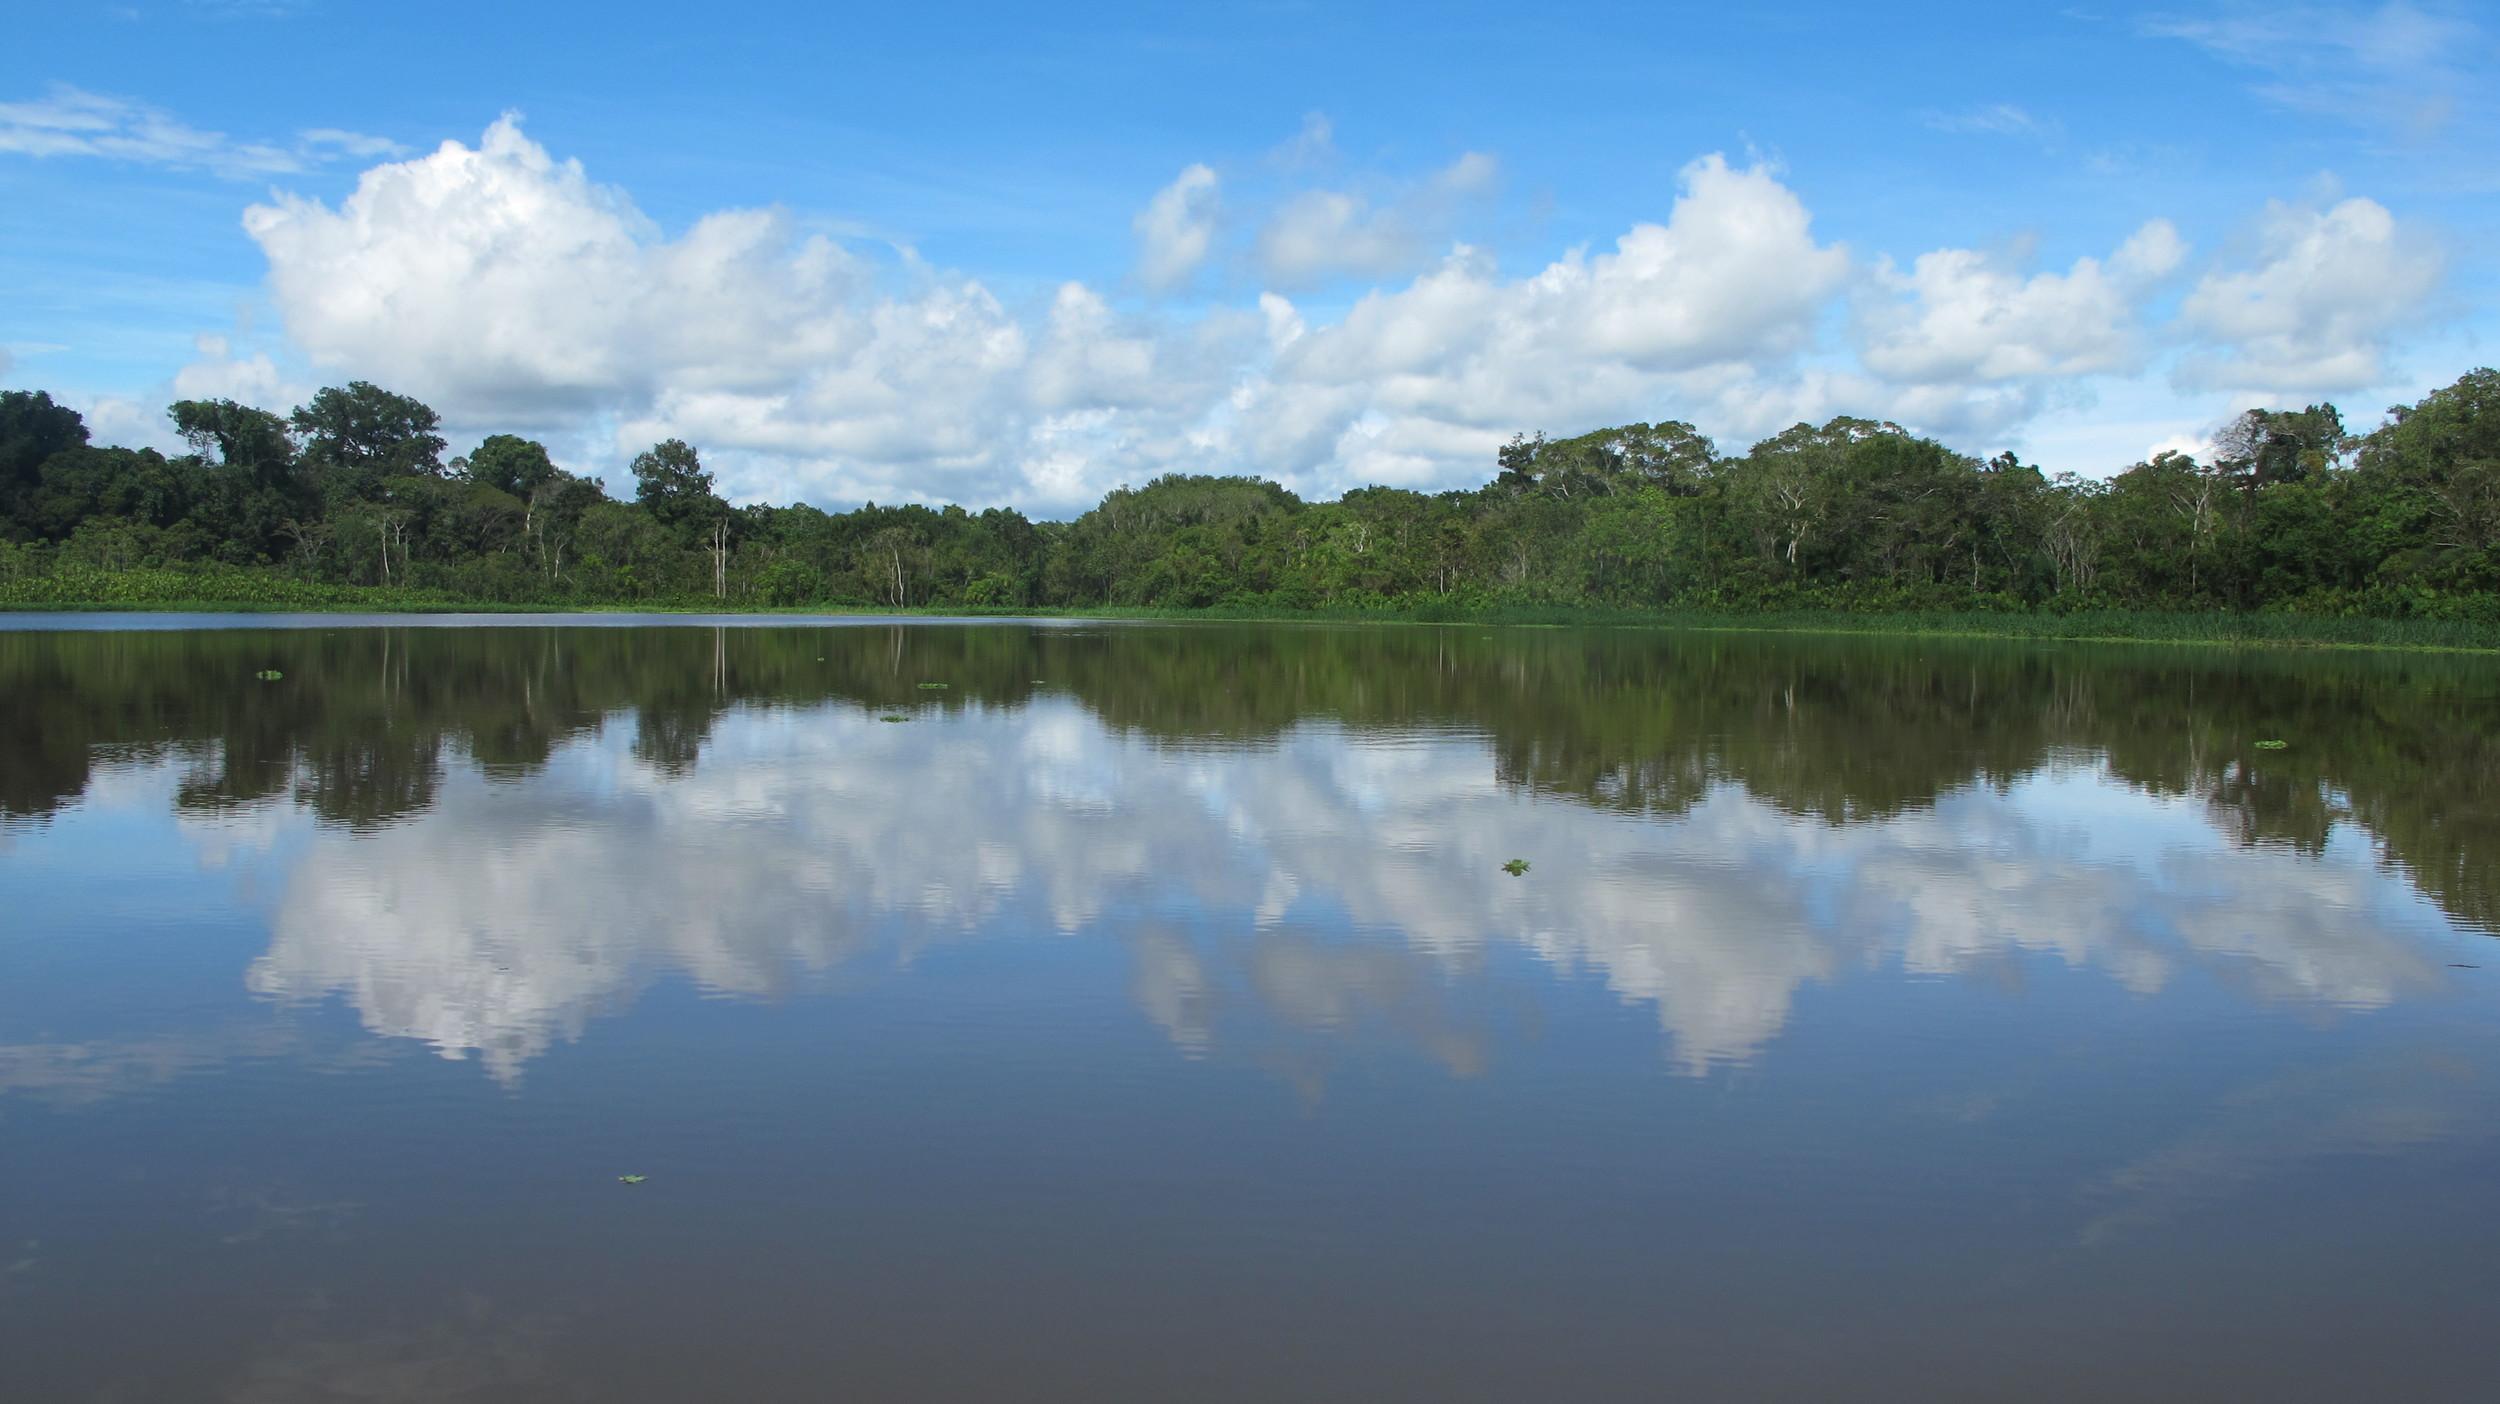 Amazon outback, Peru